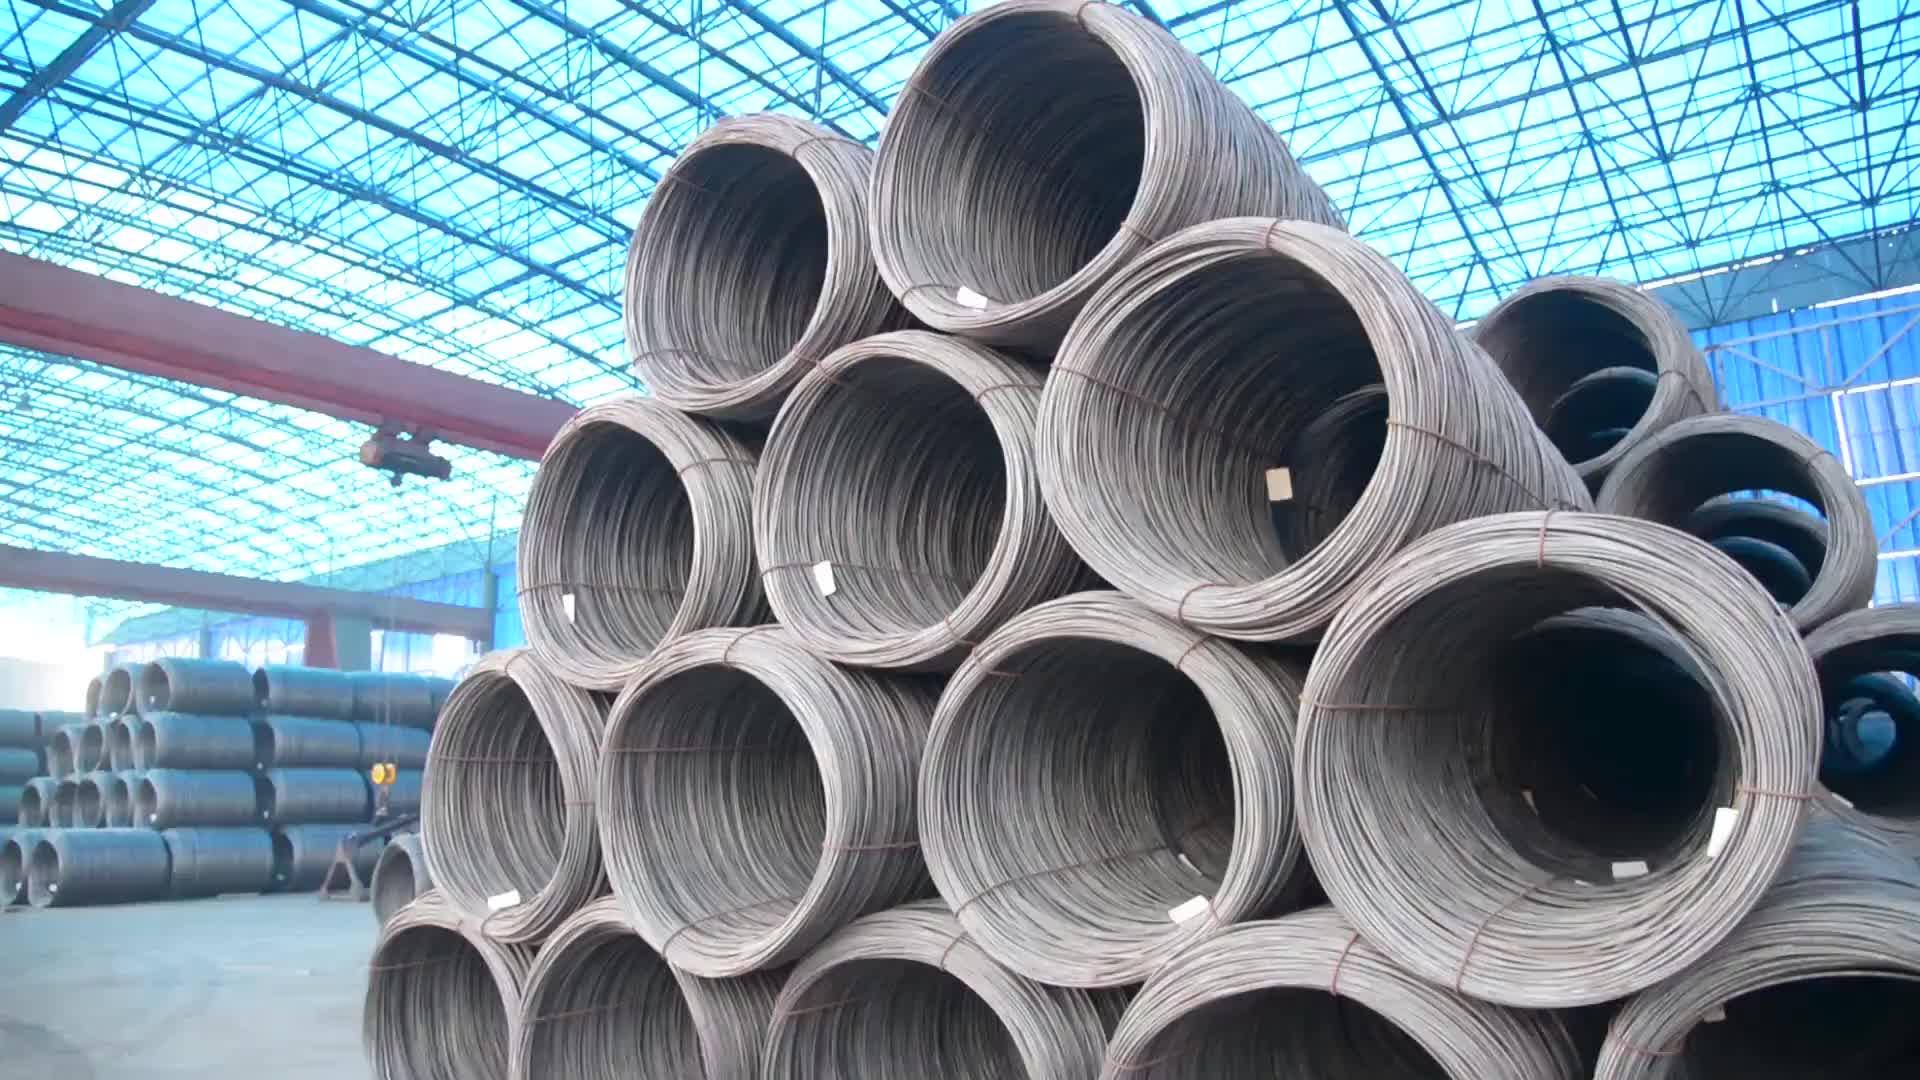 Pabrik Harga 4.77Mm Kawat Baja Galvanis Strand/Tetap Wire/Orang Kawat untuk ACSR